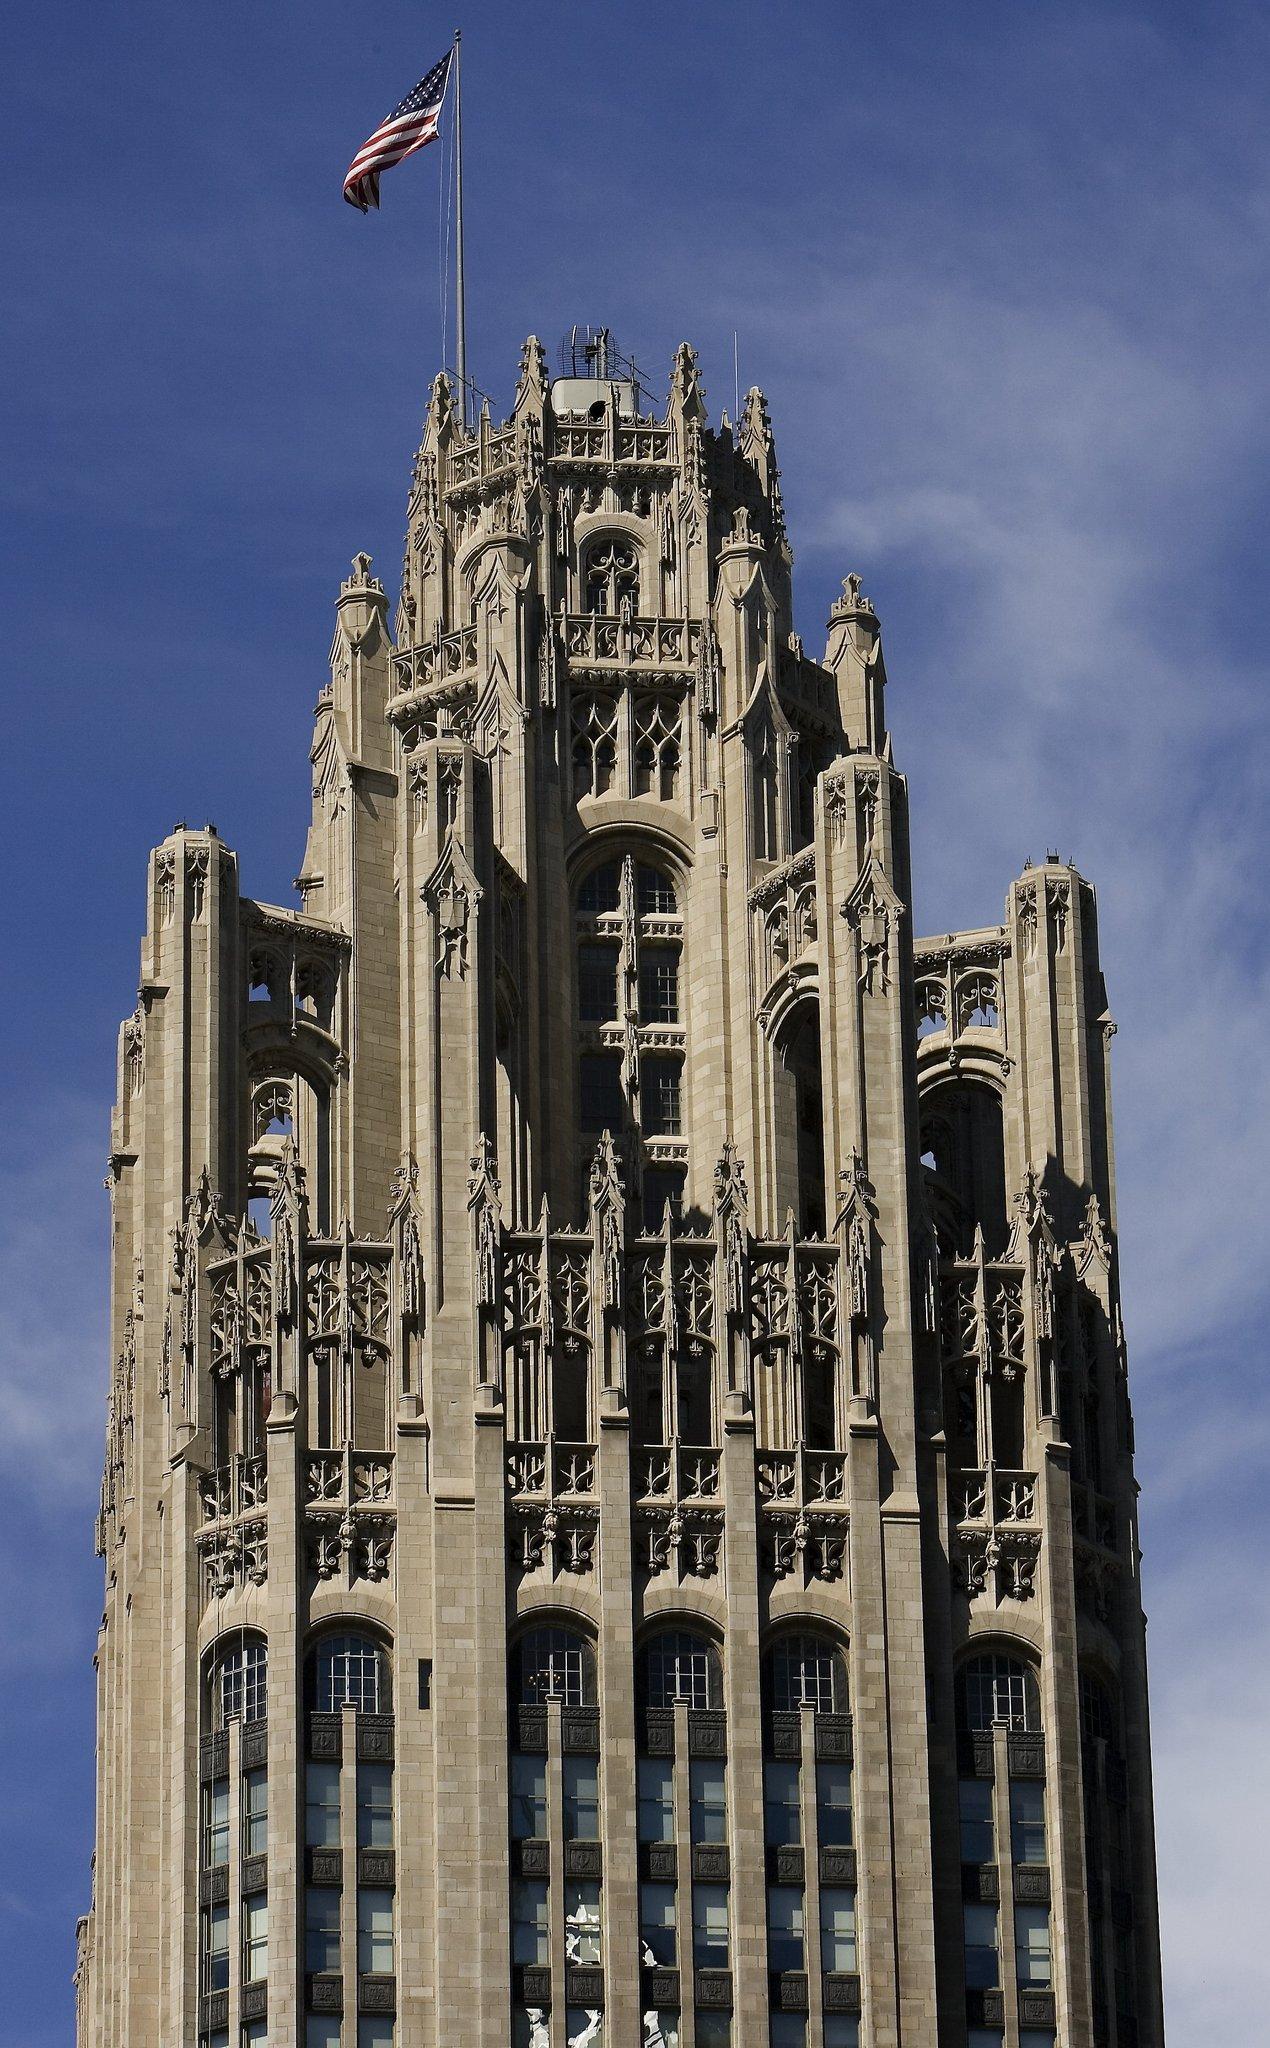 Illinois will county university park - Digital Access To Chicago Tribune